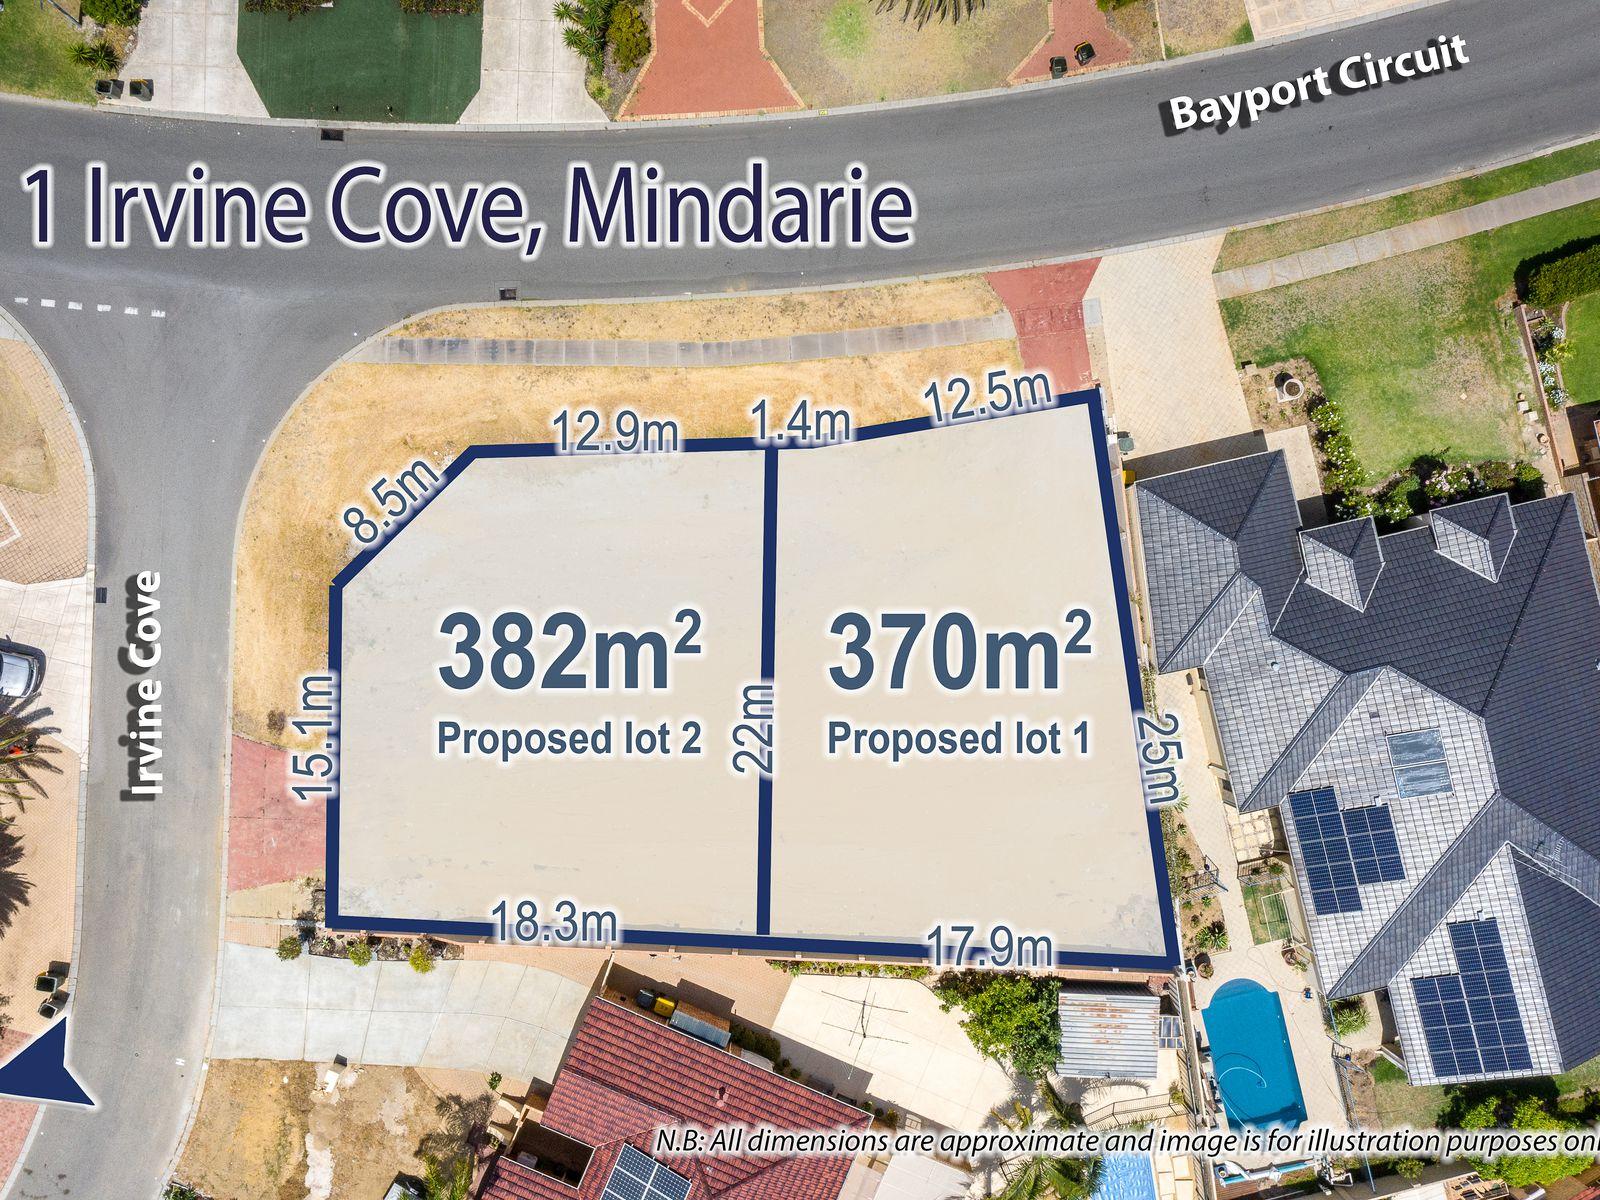 1 Irvine Cove, Mindarie